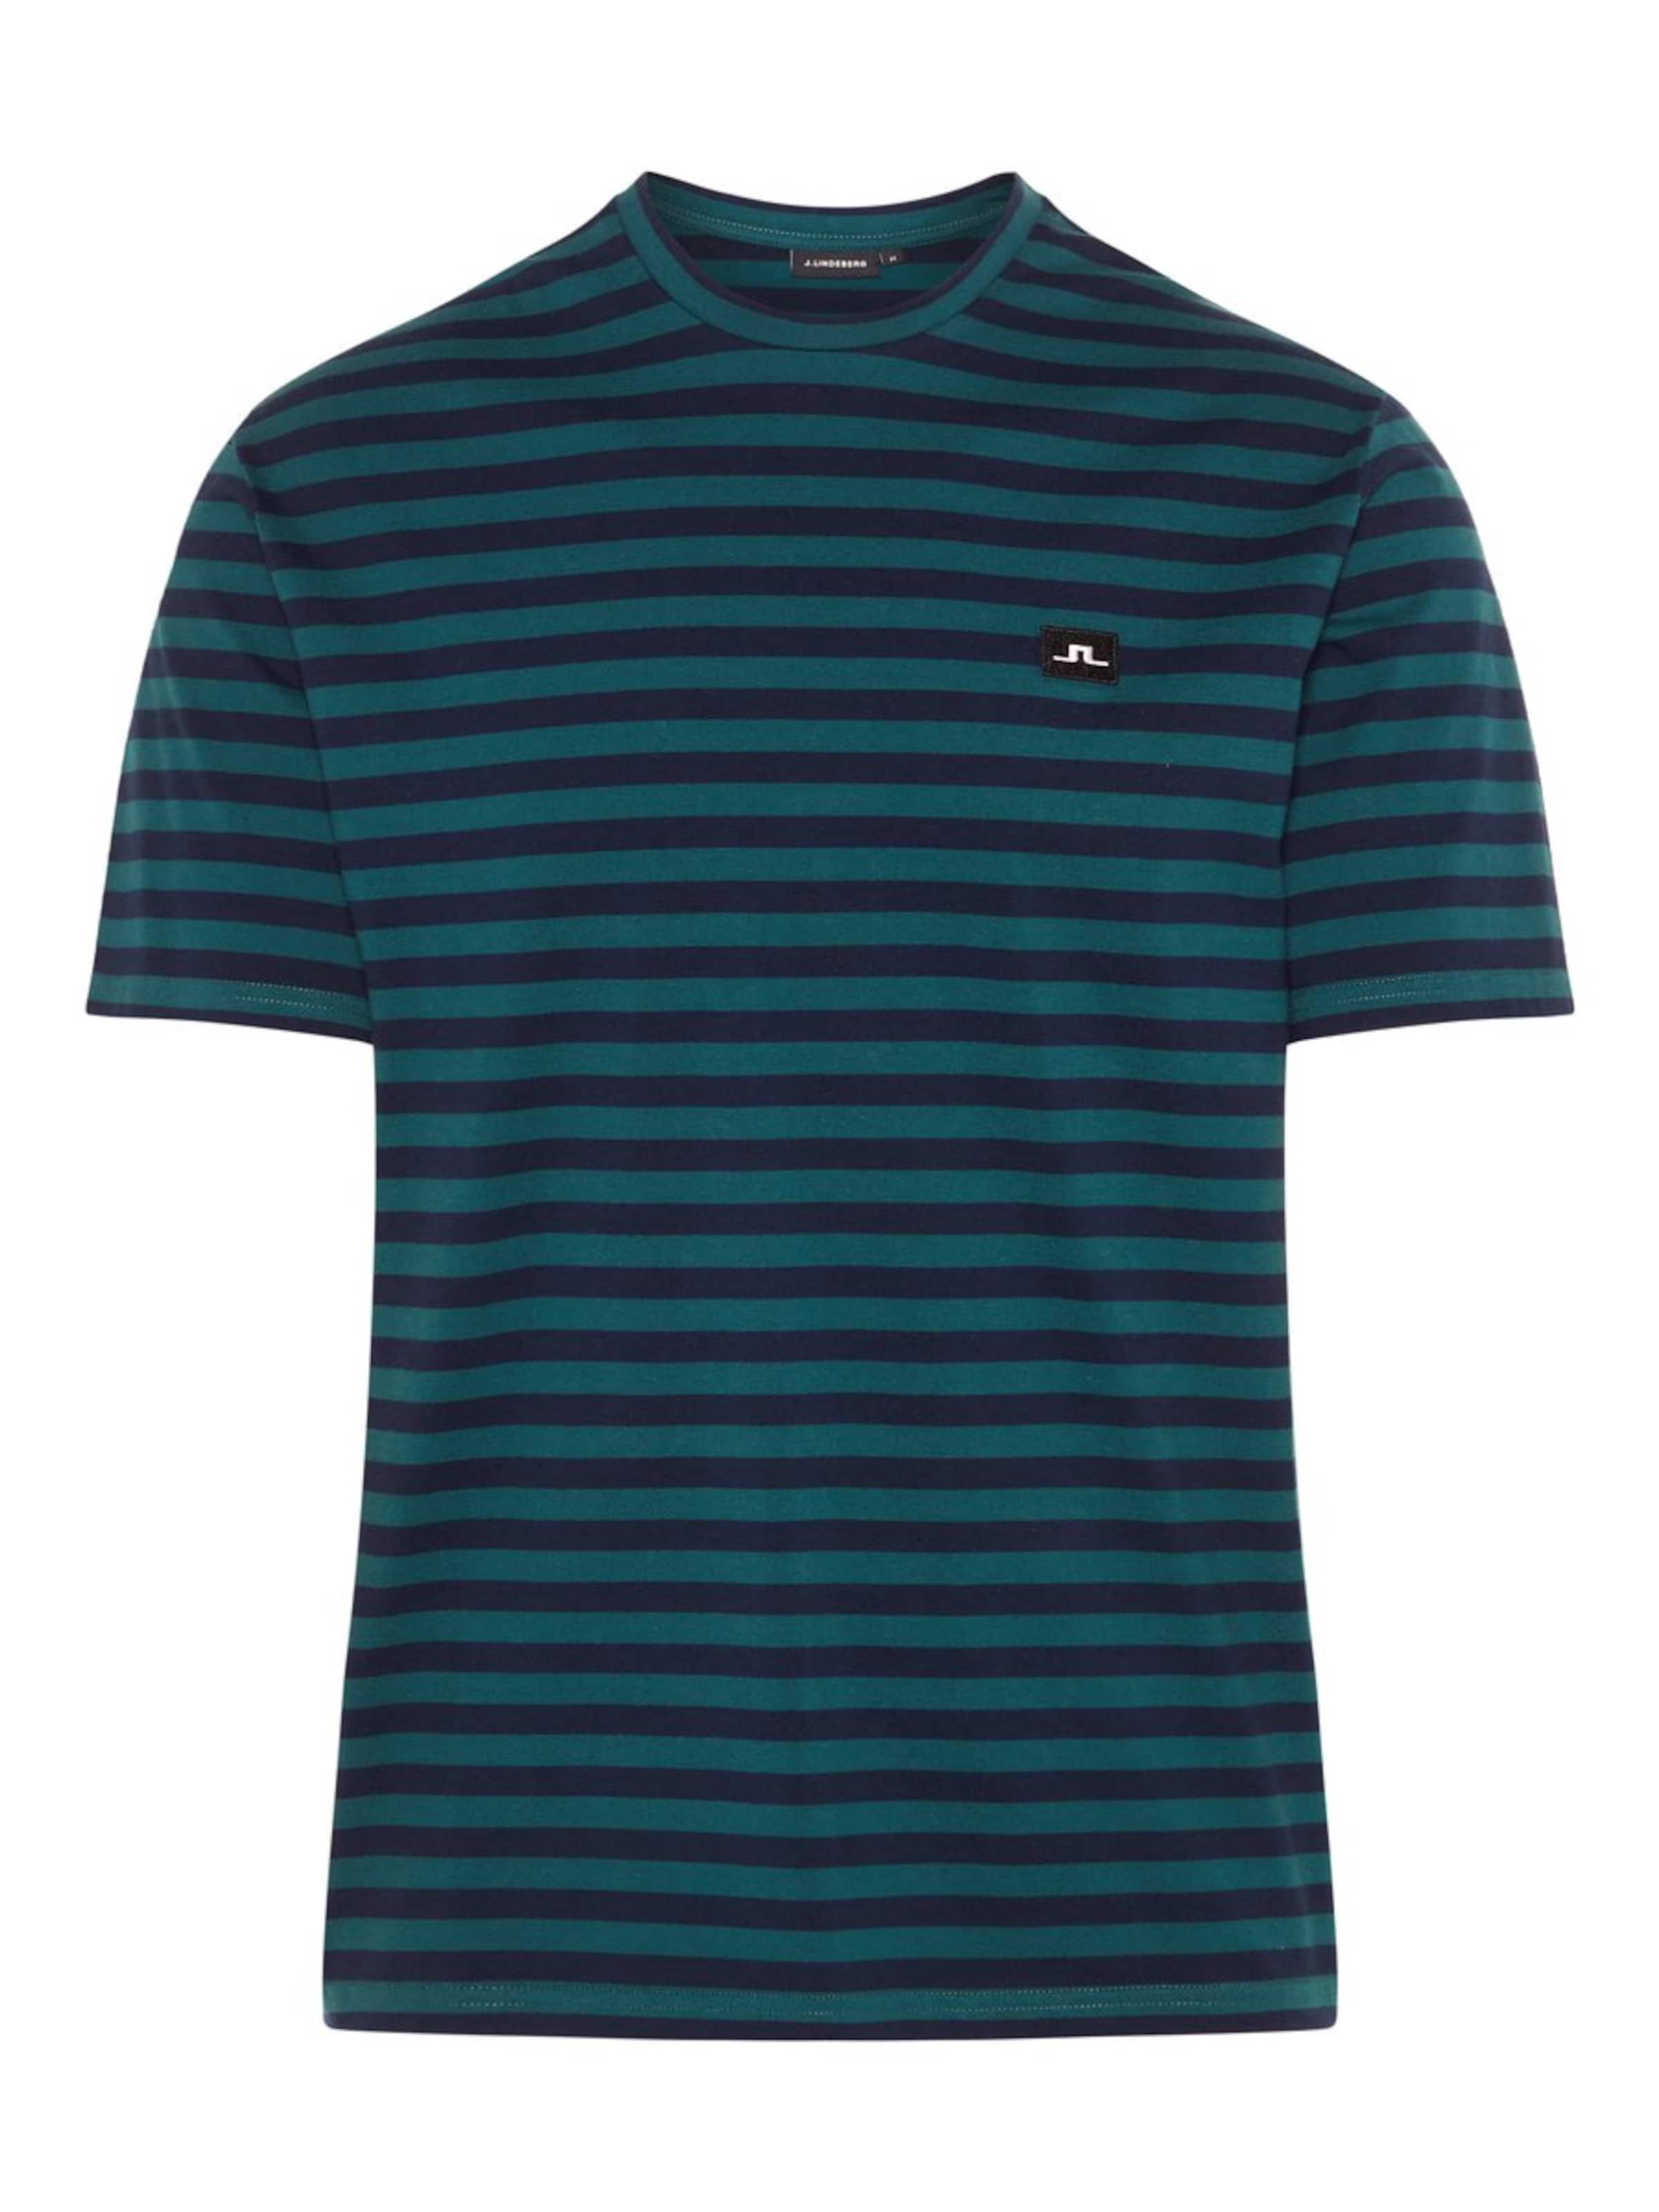 En Stripe' J shirt lindeberg MarineSapin T Plain 'charles zqMpSUV